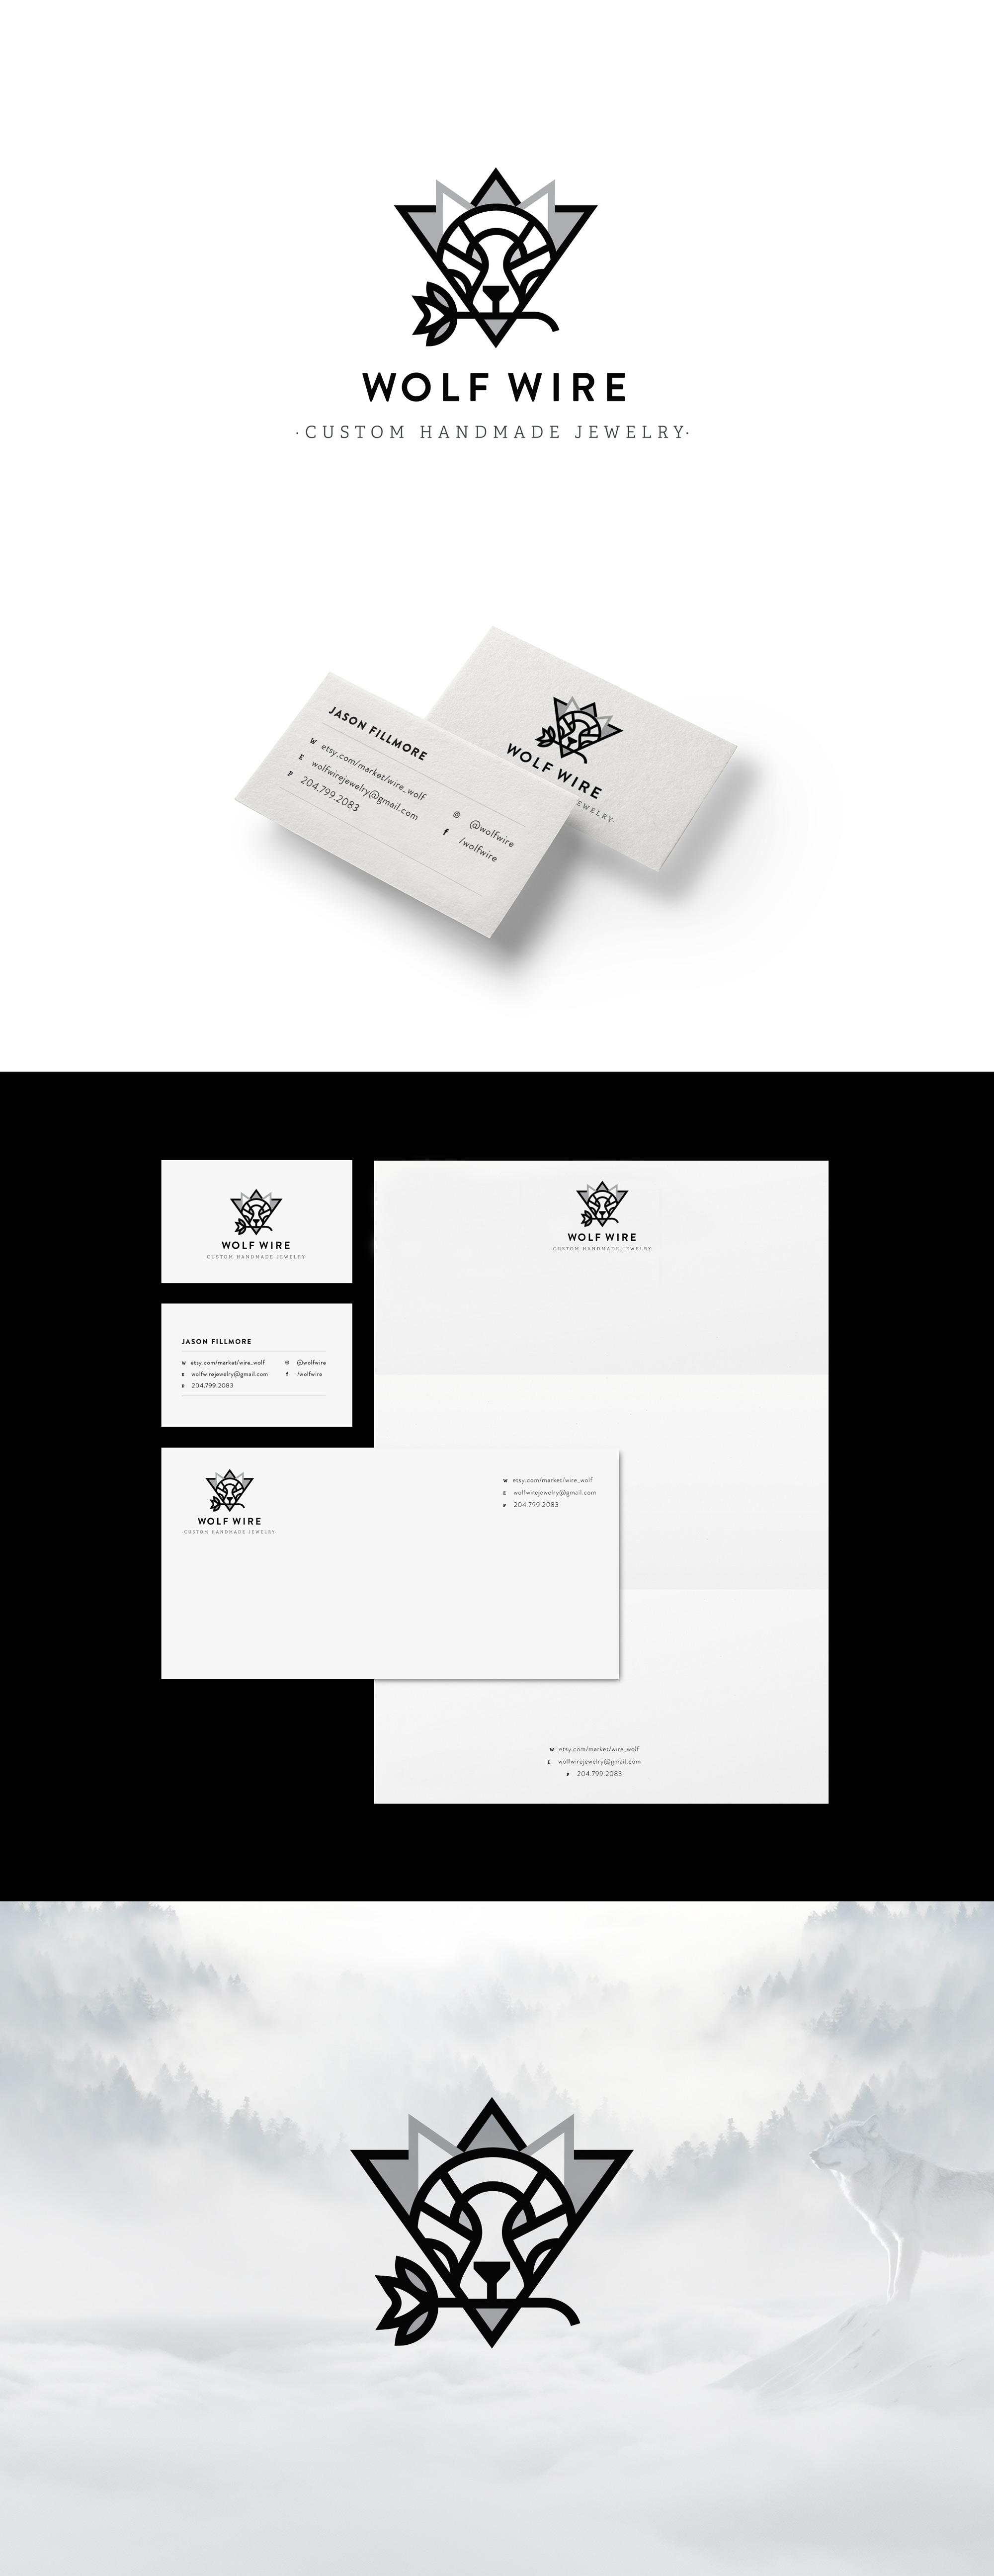 winnipeg-branding.jpg